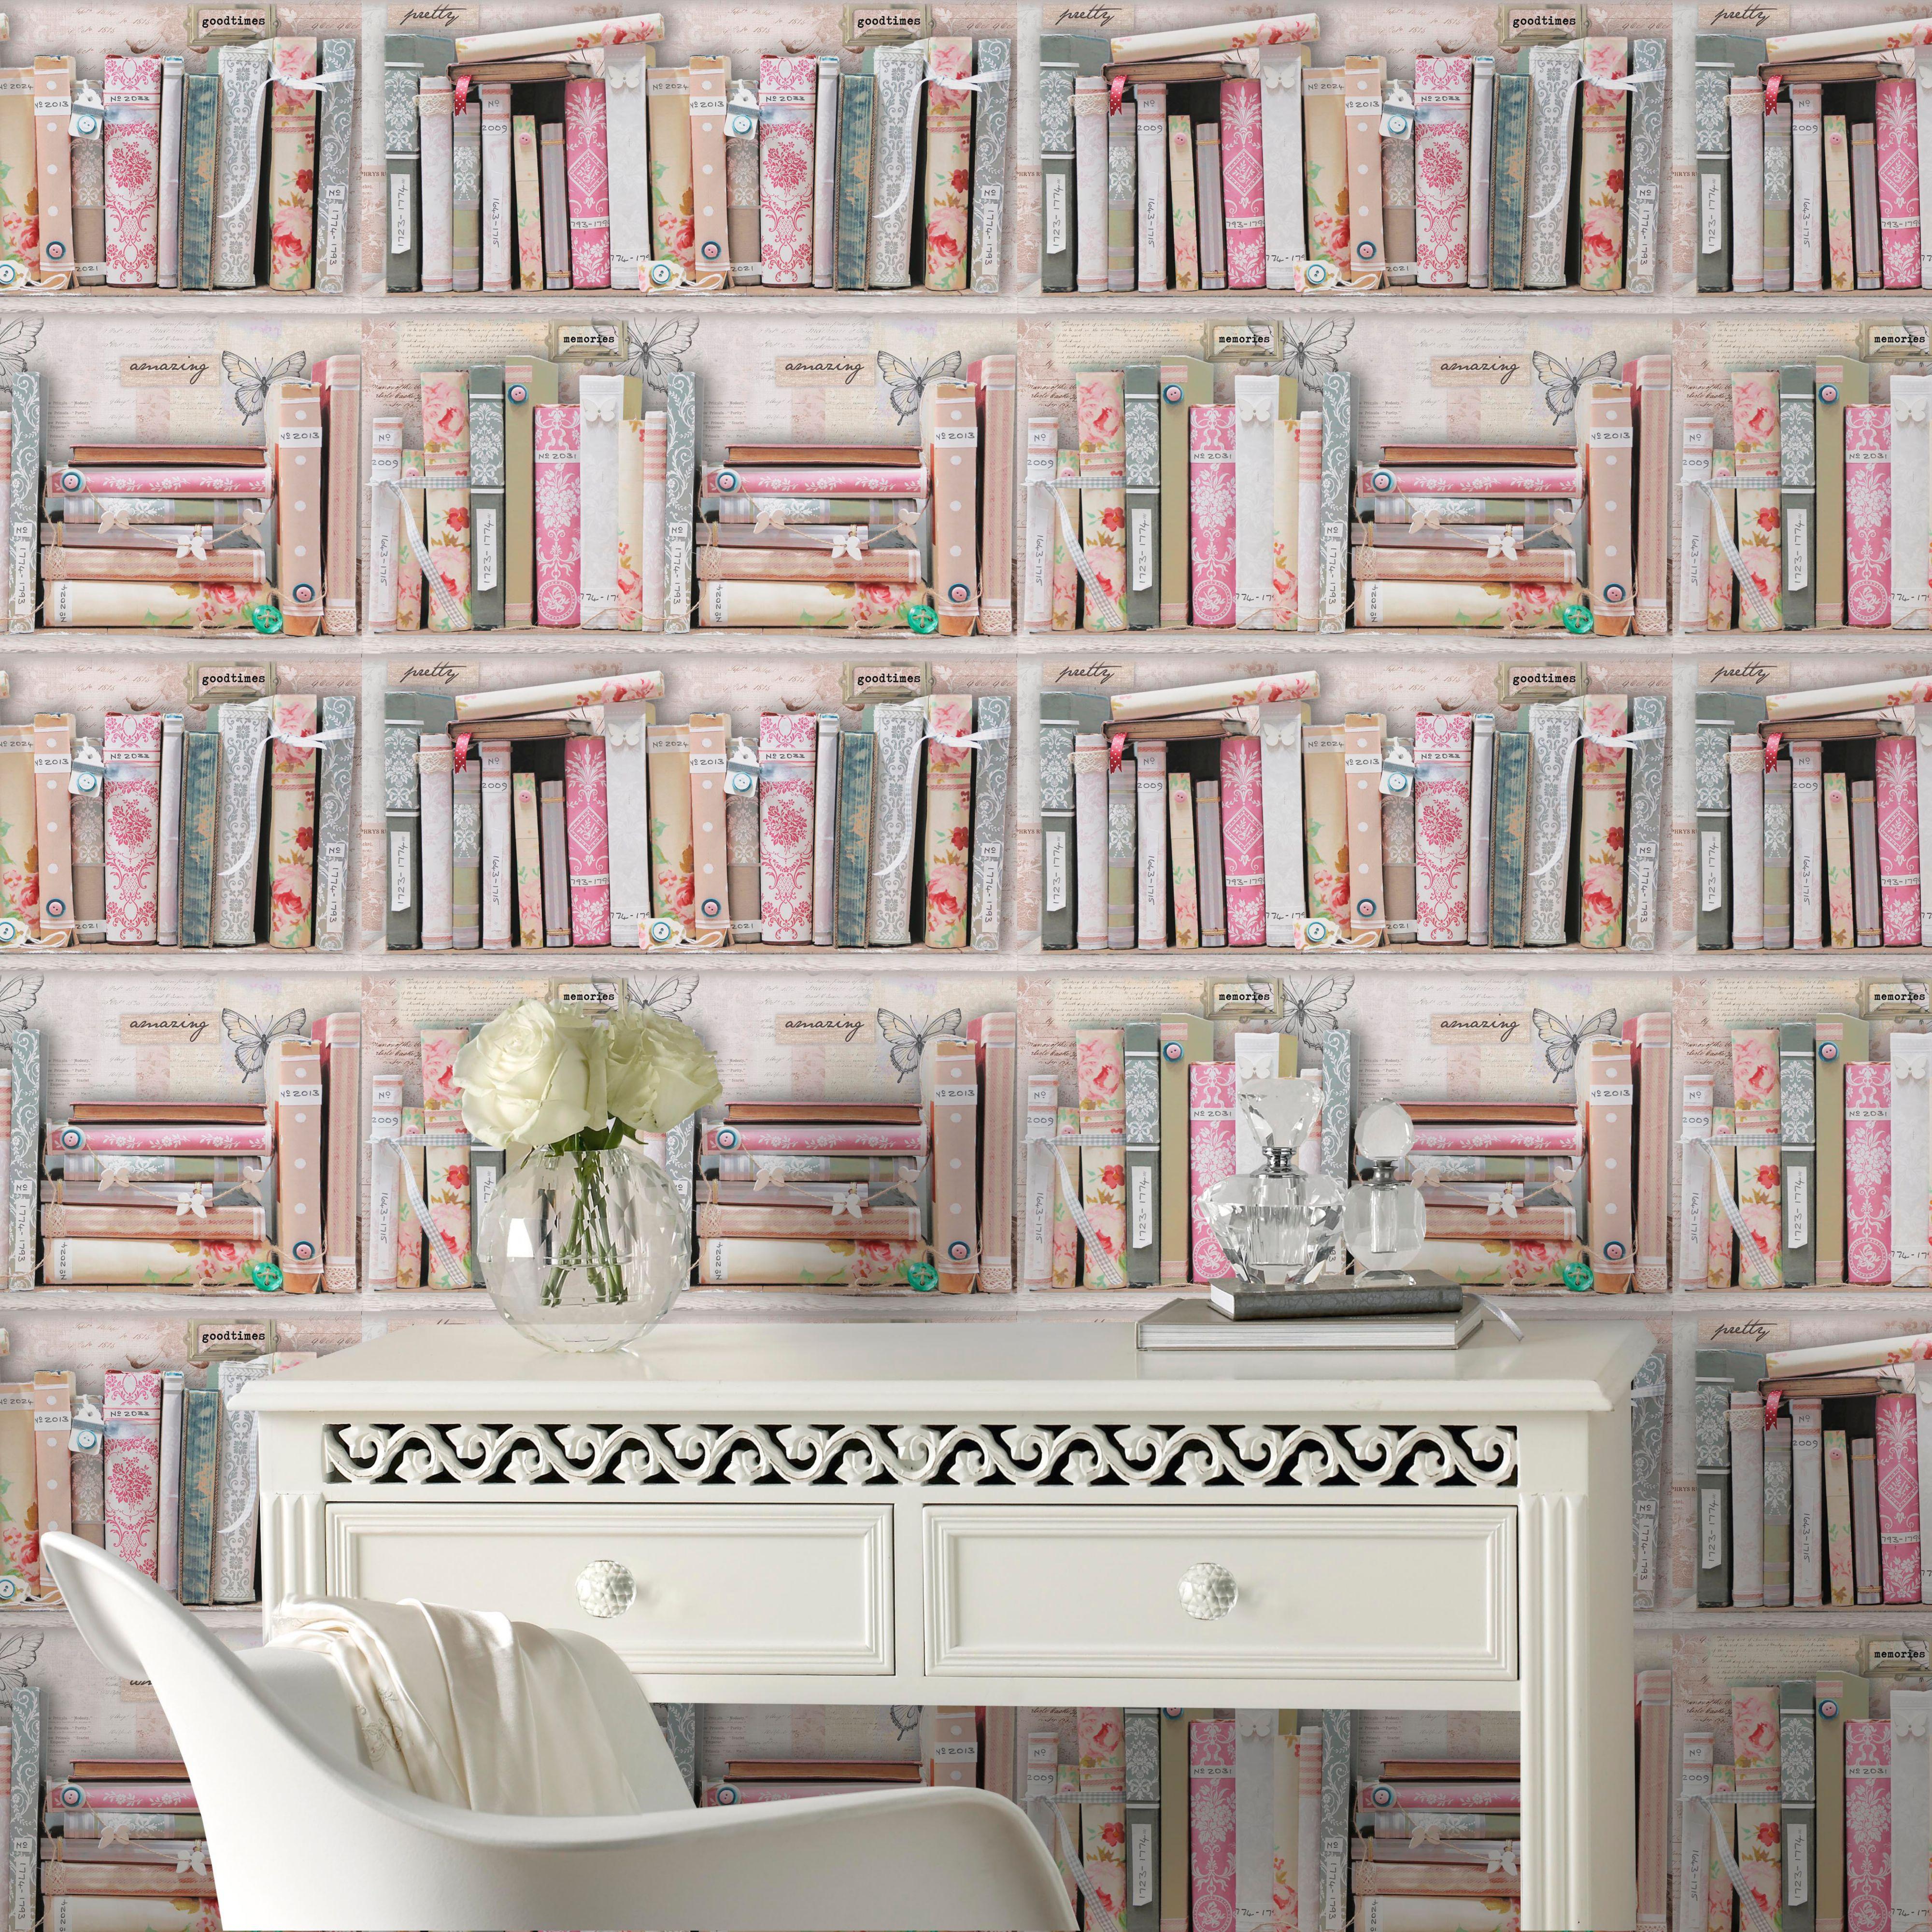 office organizer pink cube itm versatile furniture new bookcase shelf storage home